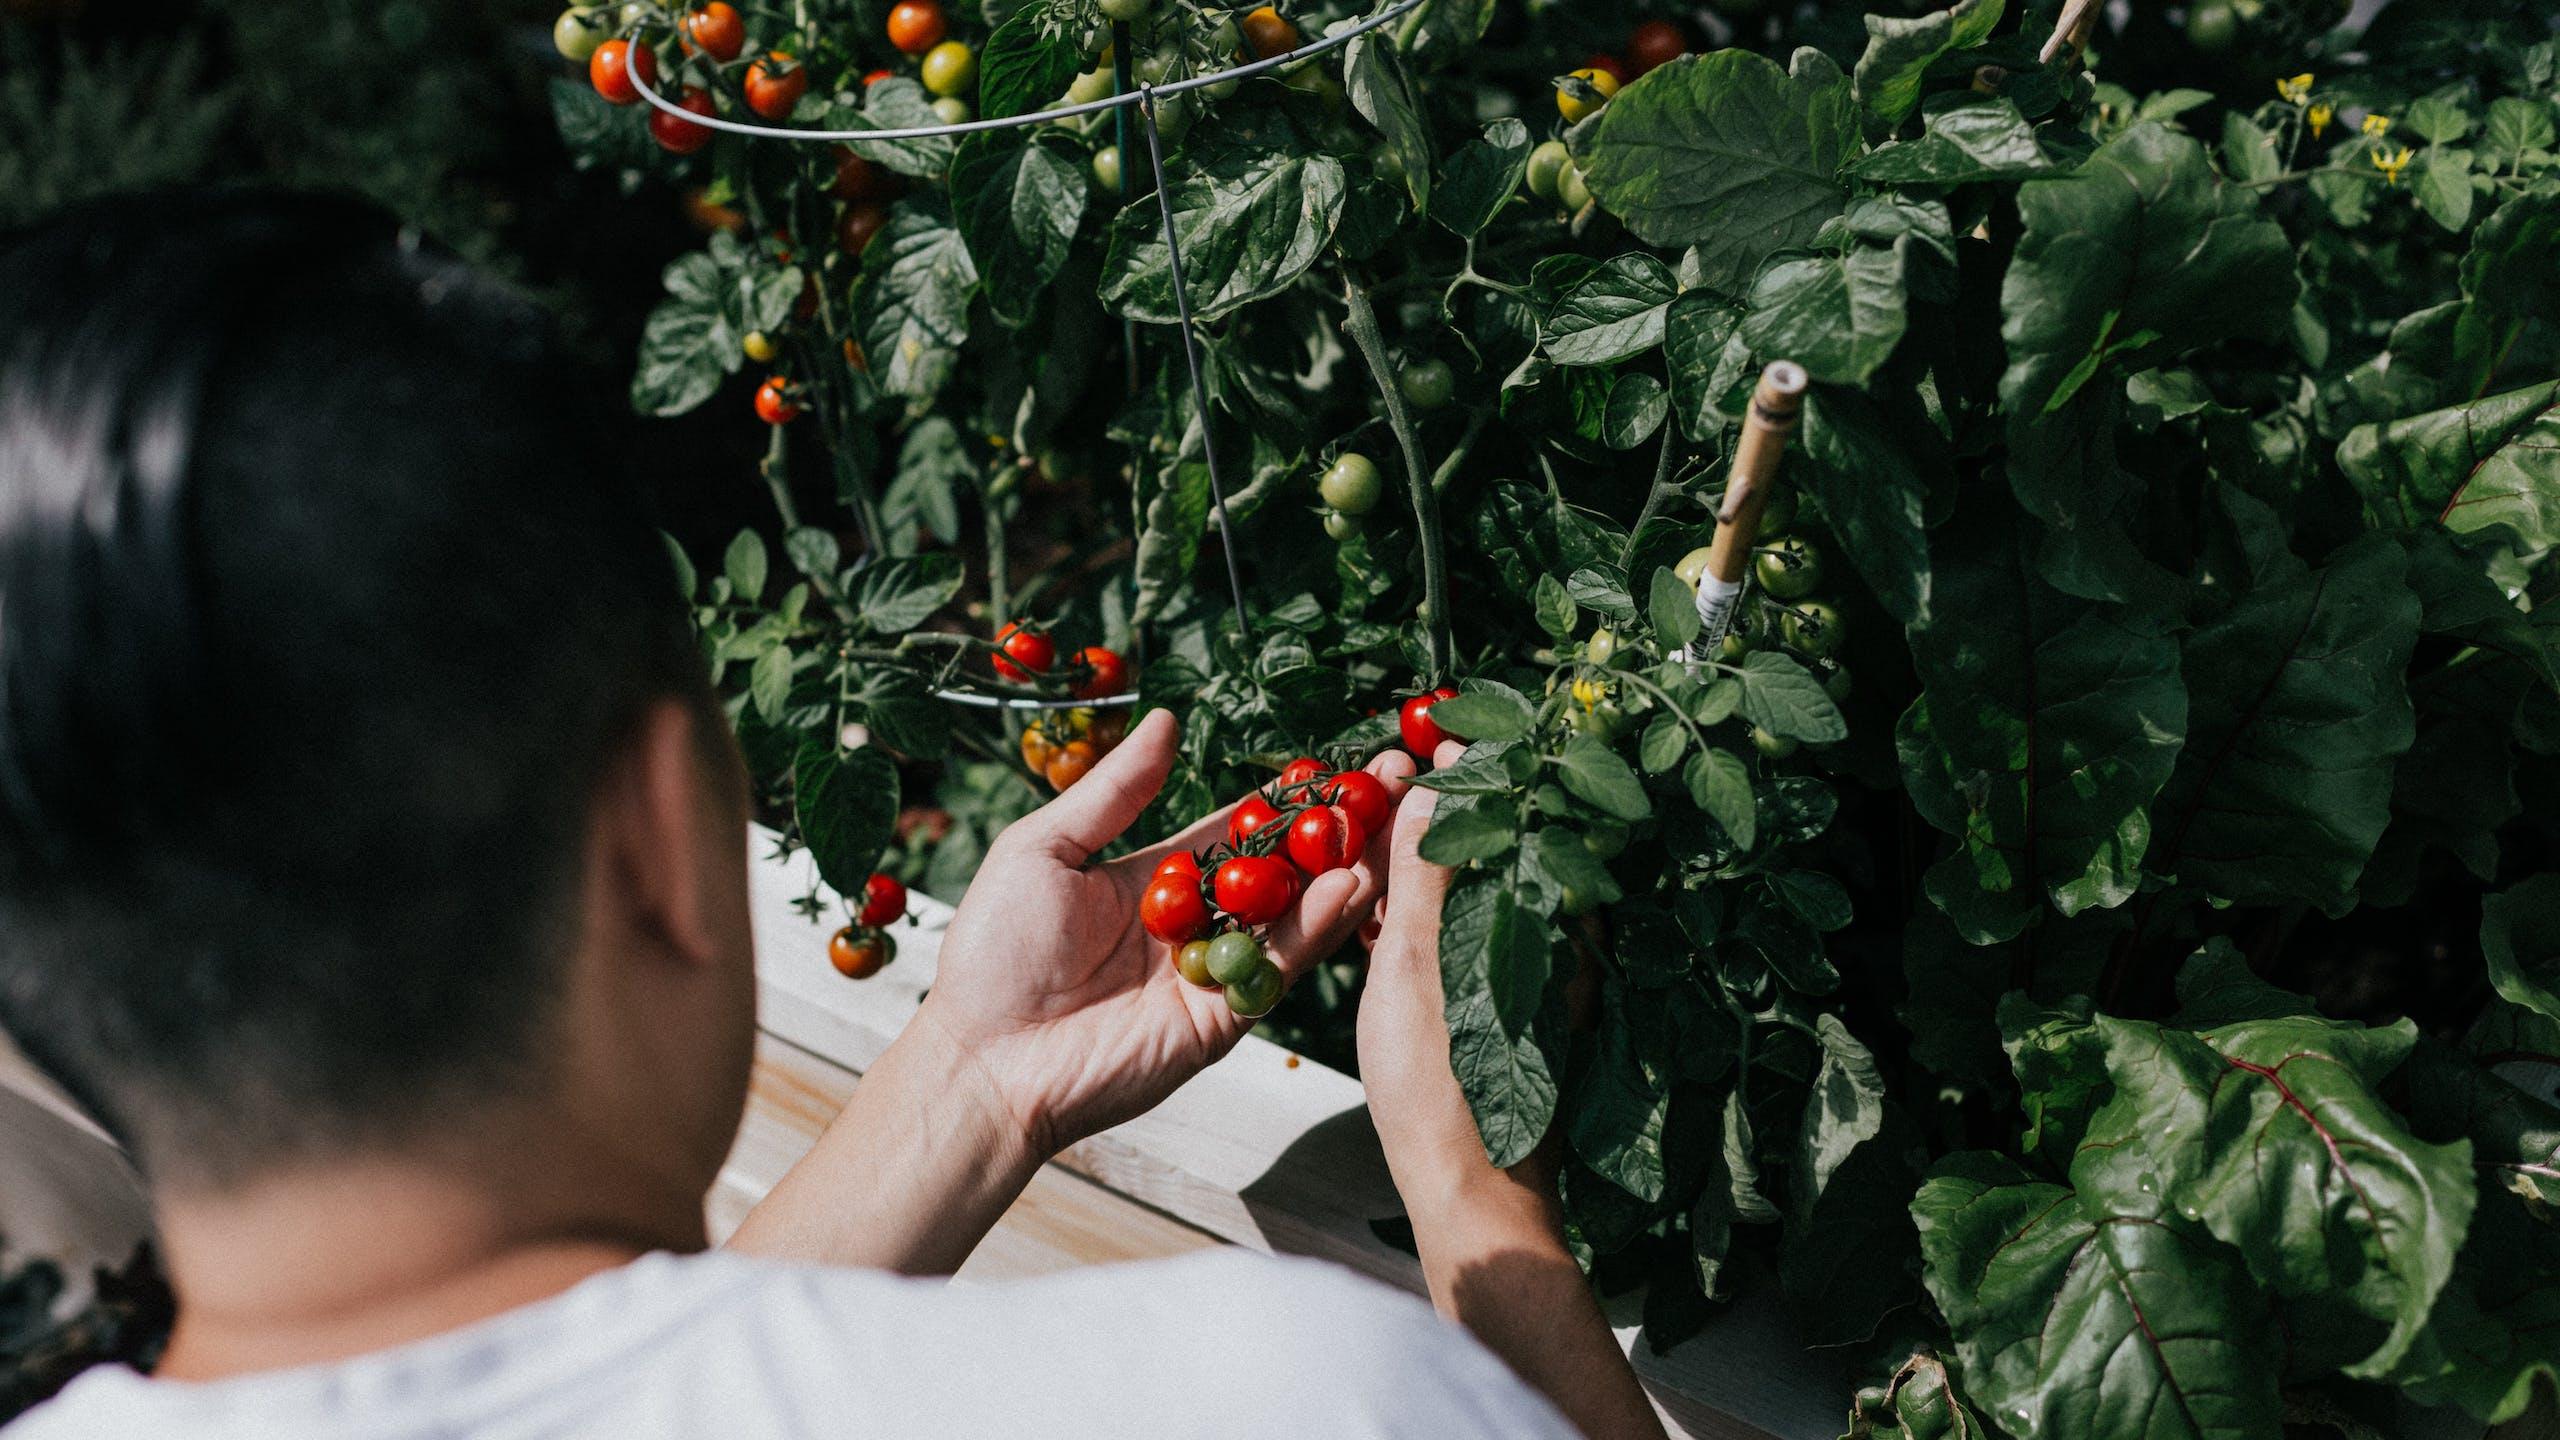 homme qui cultive tomates cerises